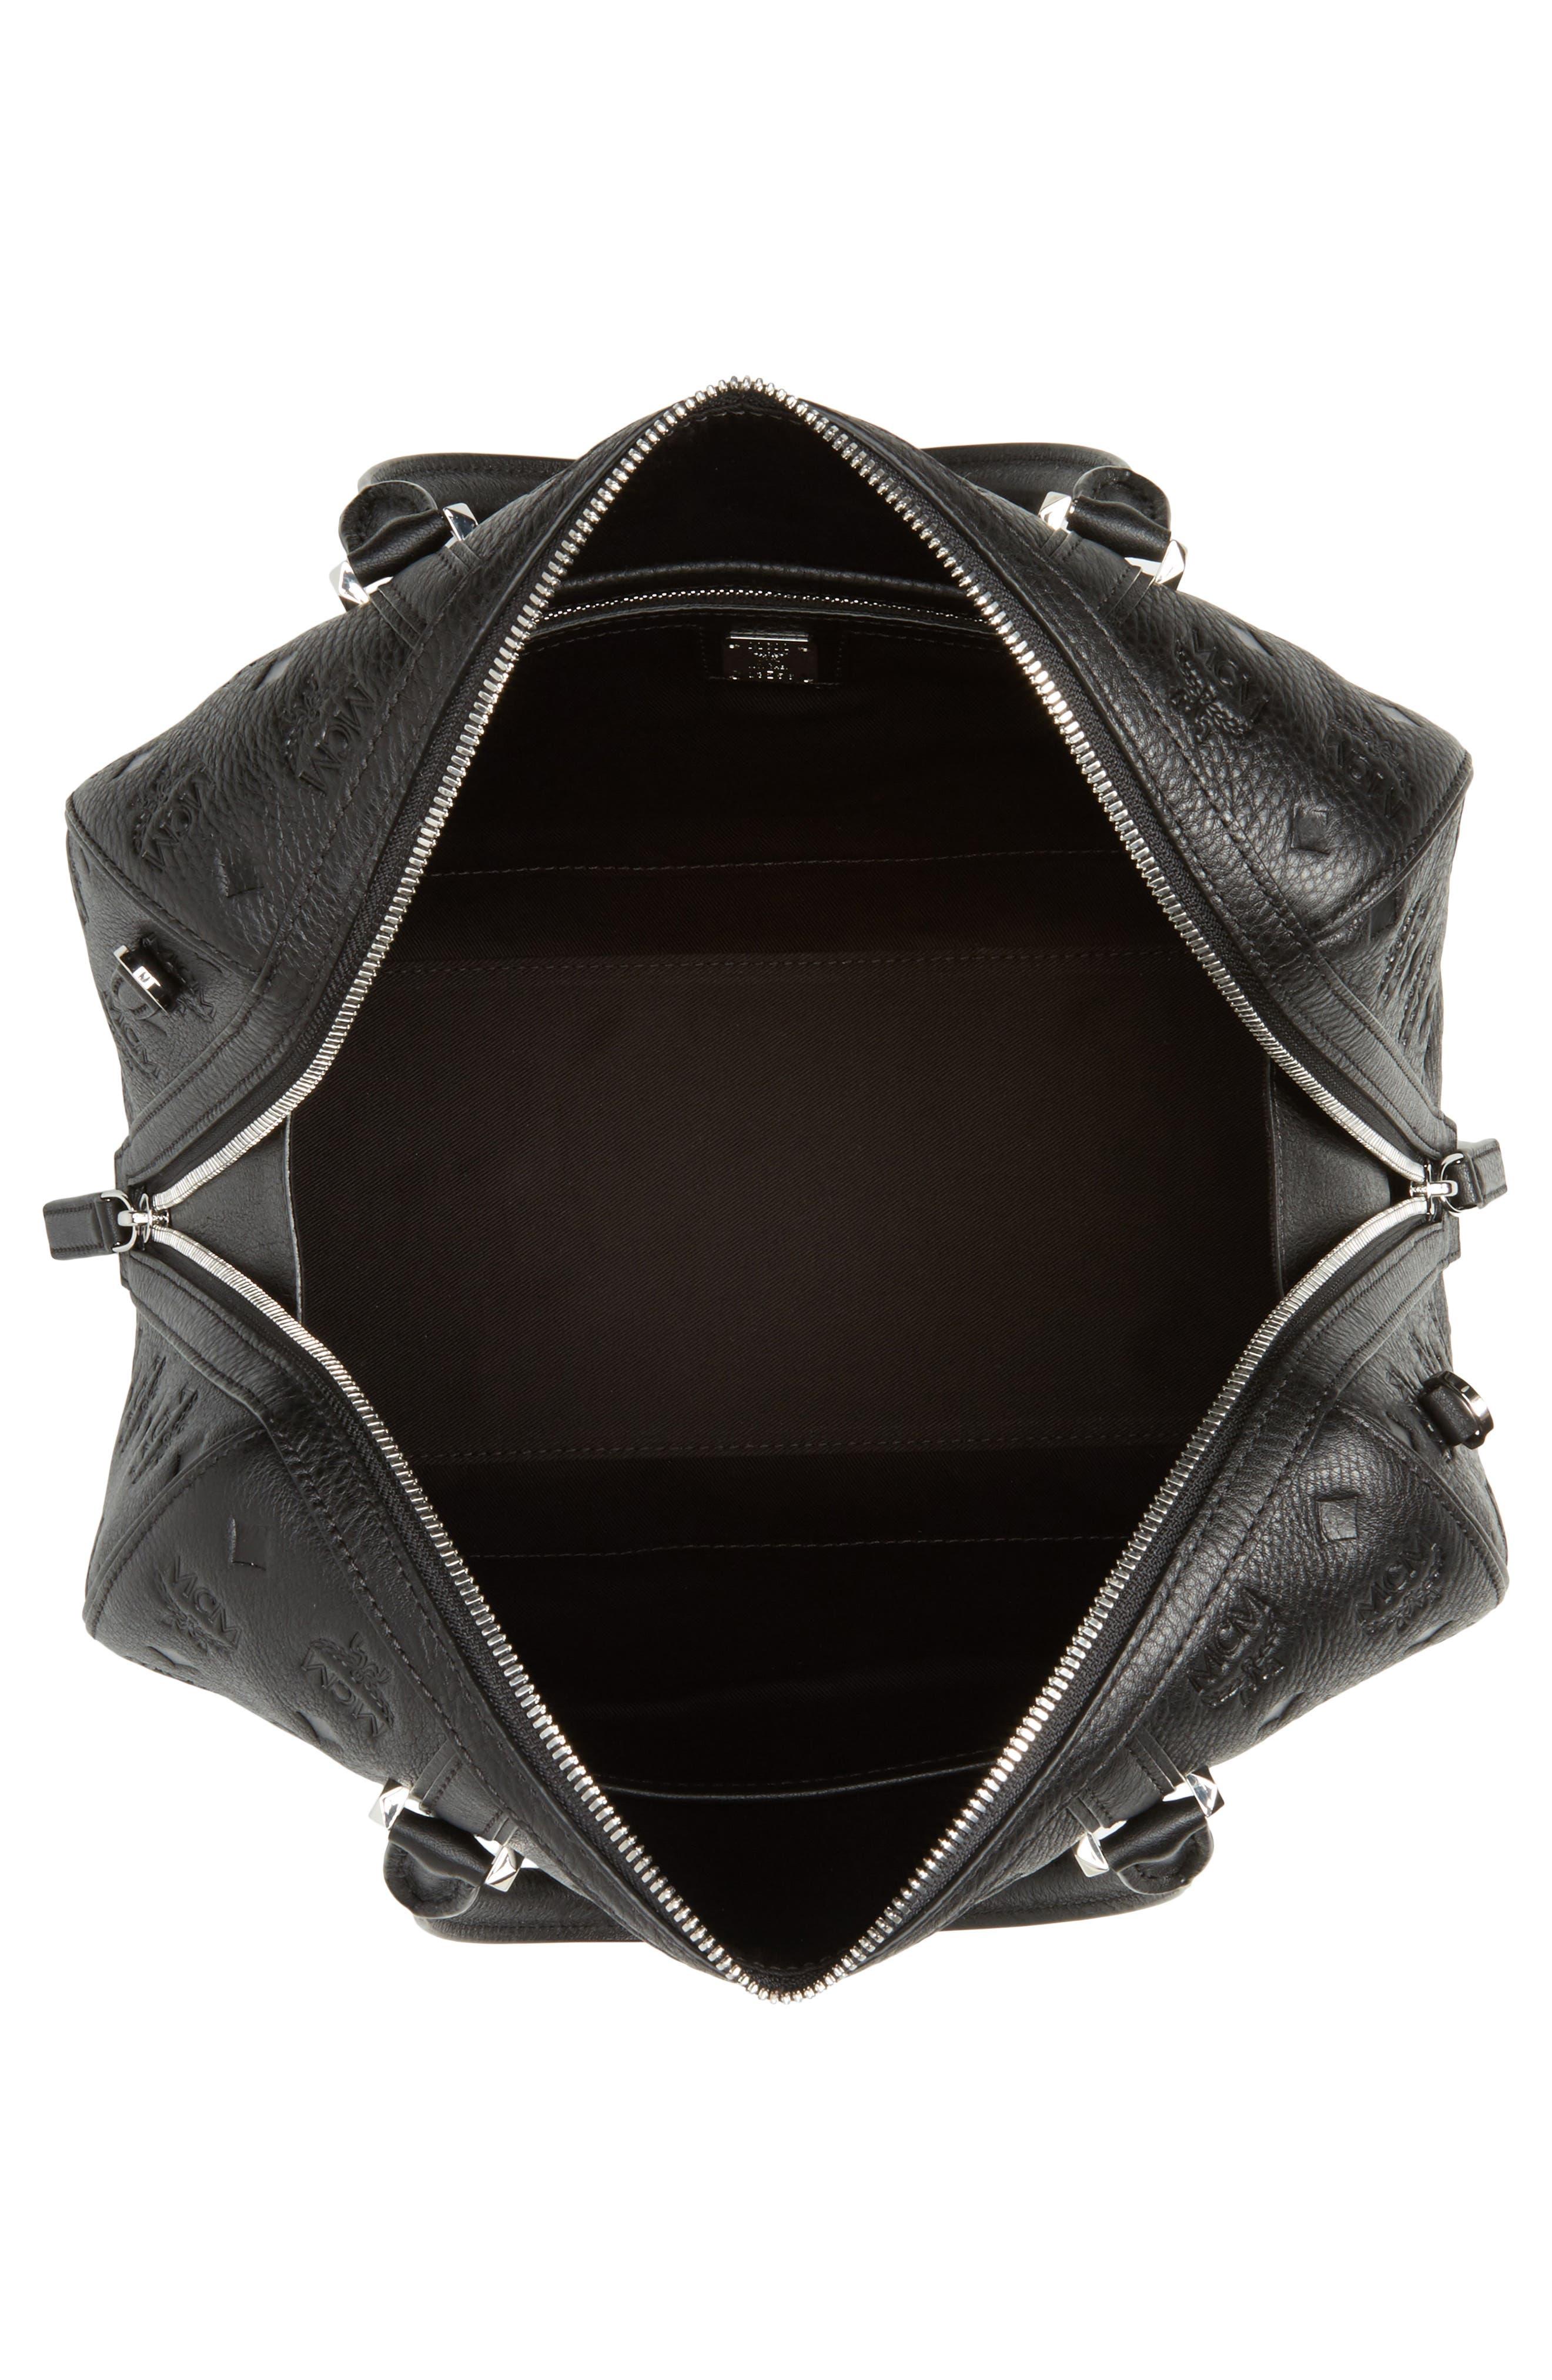 Signature Monogram Embossed Leather Crossbody Bag,                             Alternate thumbnail 4, color,                             001